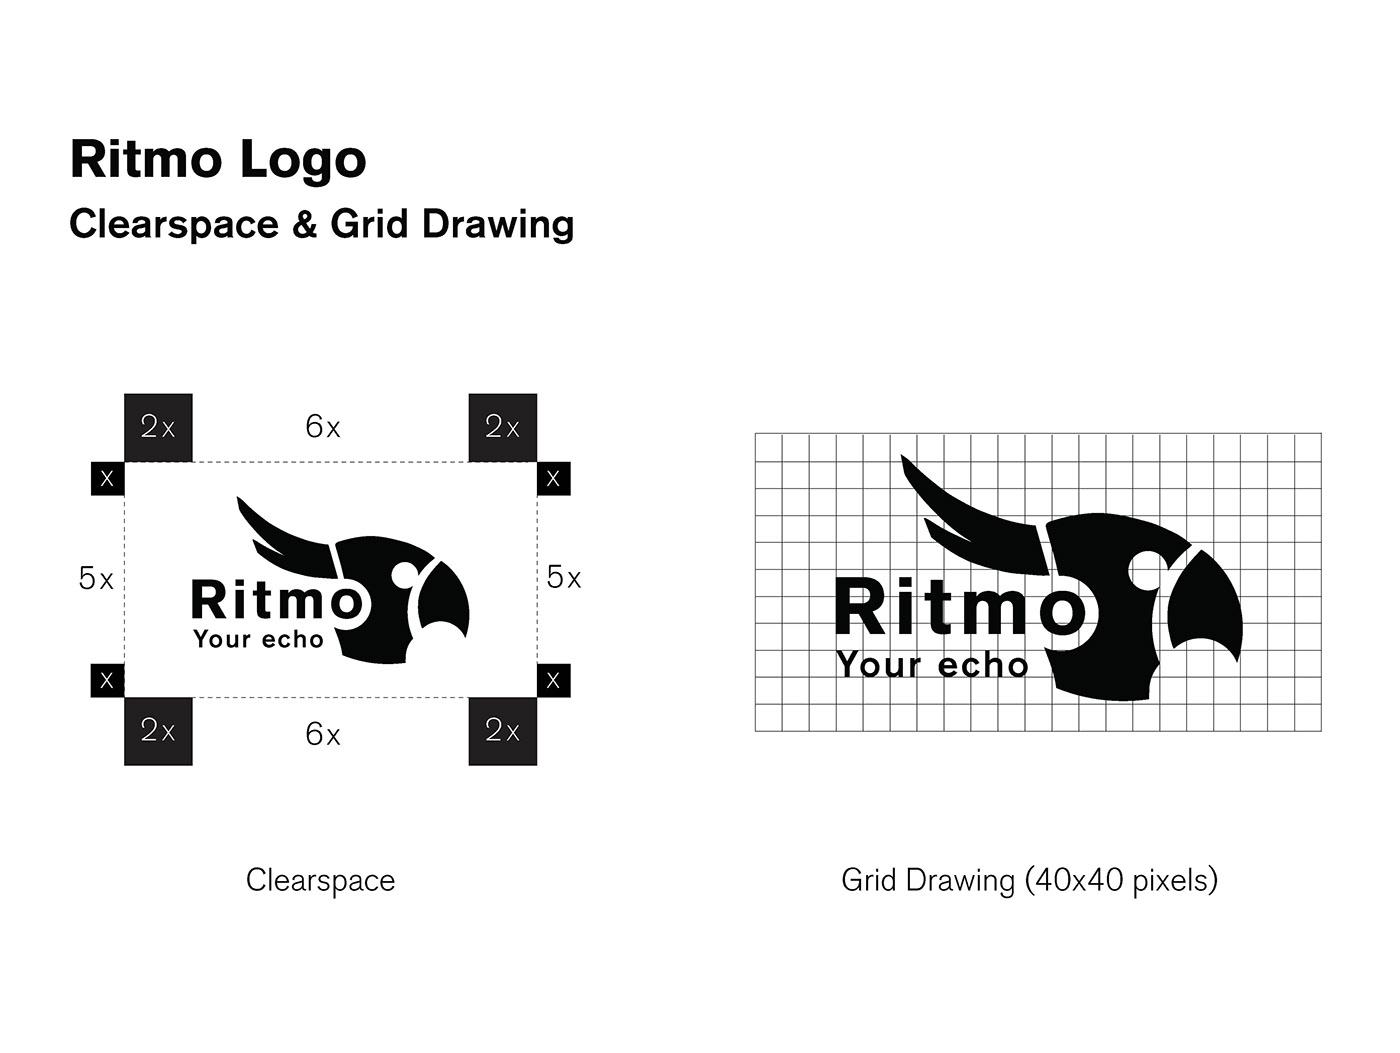 Ritmo Brand Manual on Behance